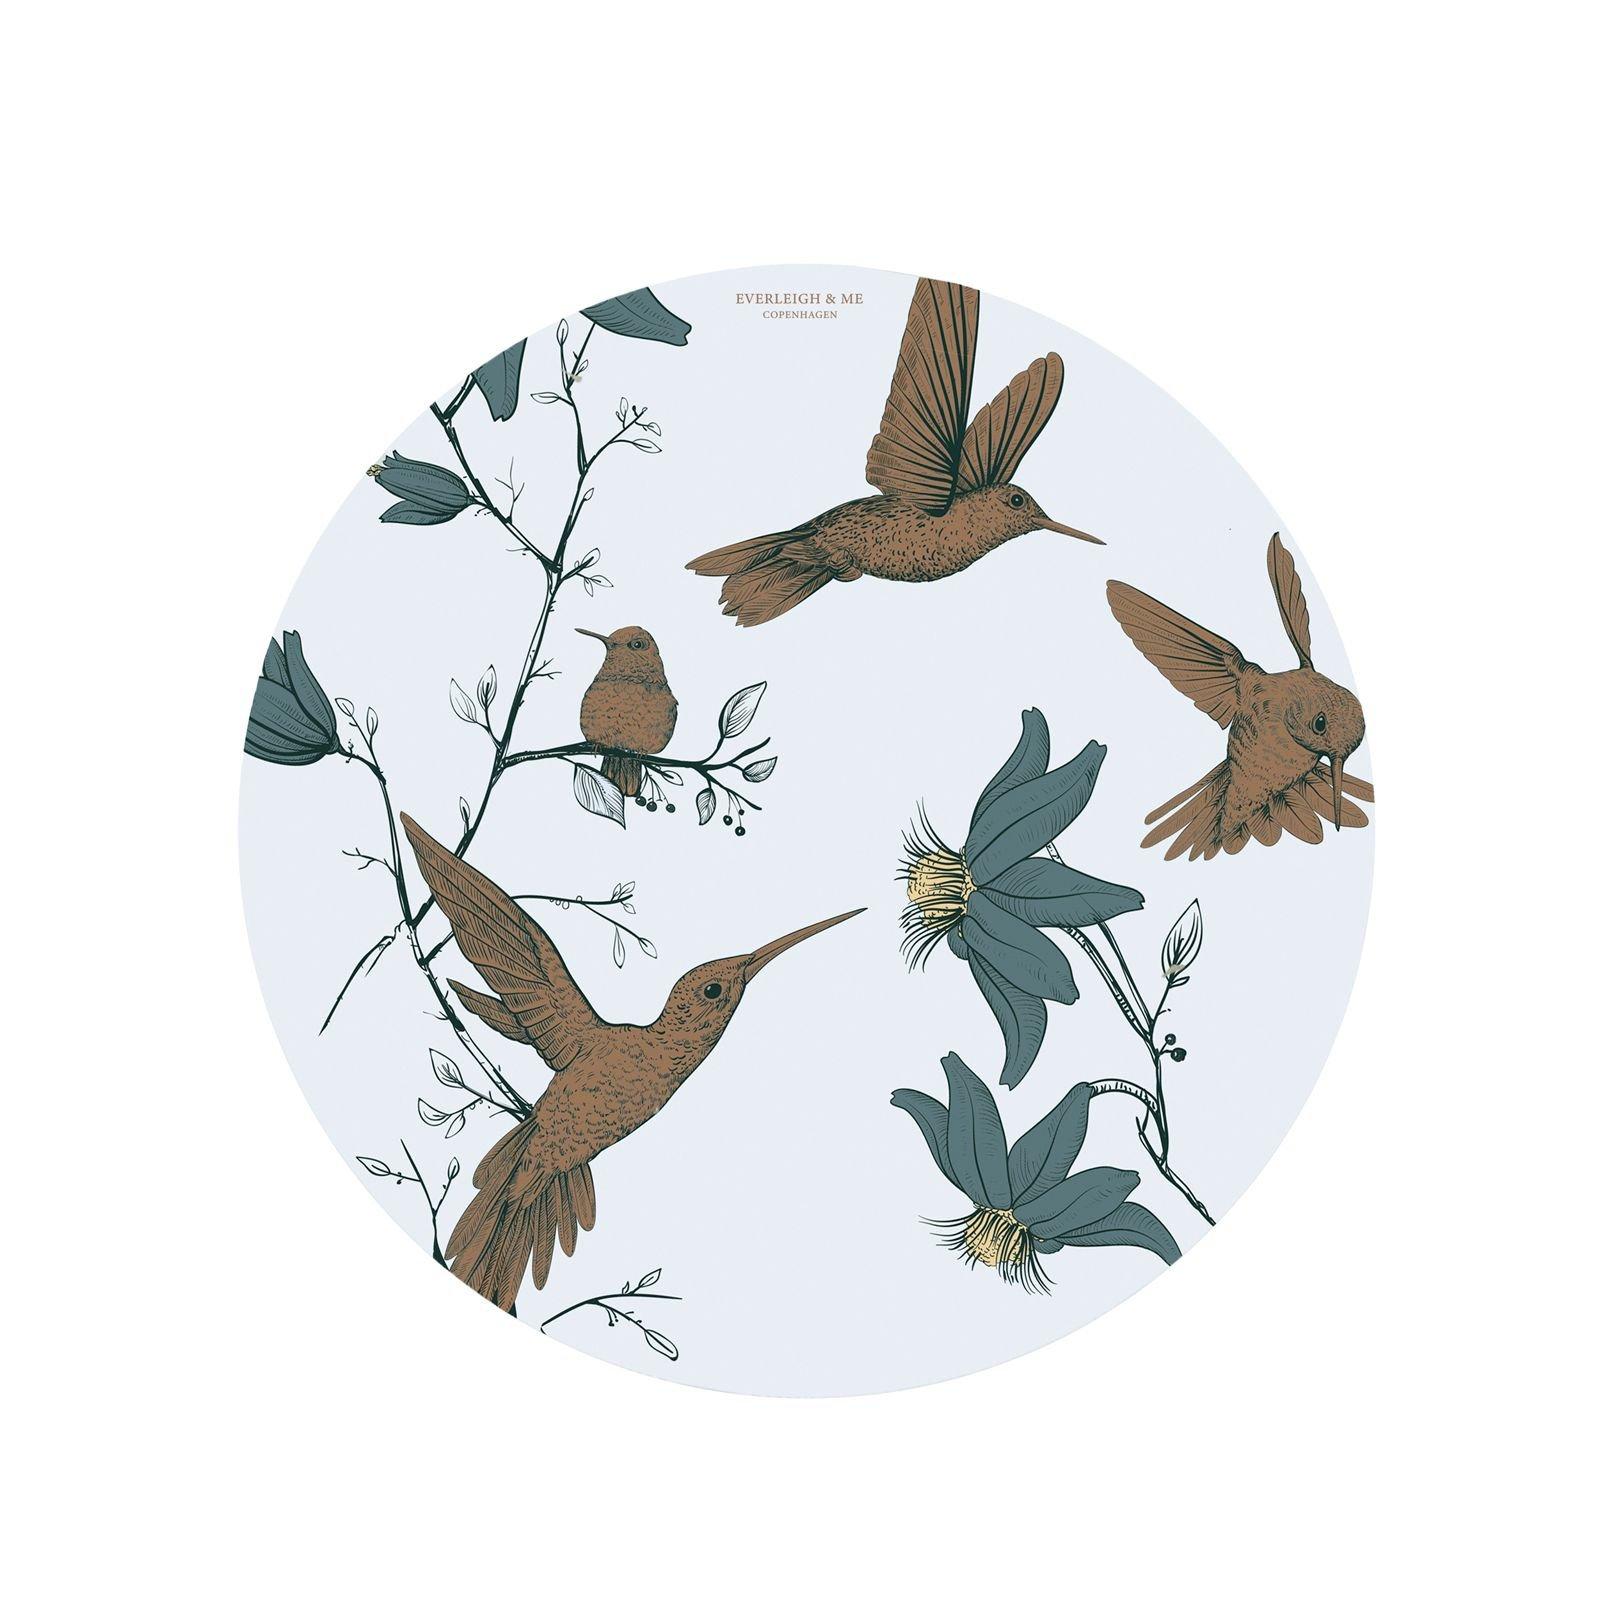 Everleigh & Me - Splat Mat, Hummingbird Blue (38HUMMINGBIRDBLUE)